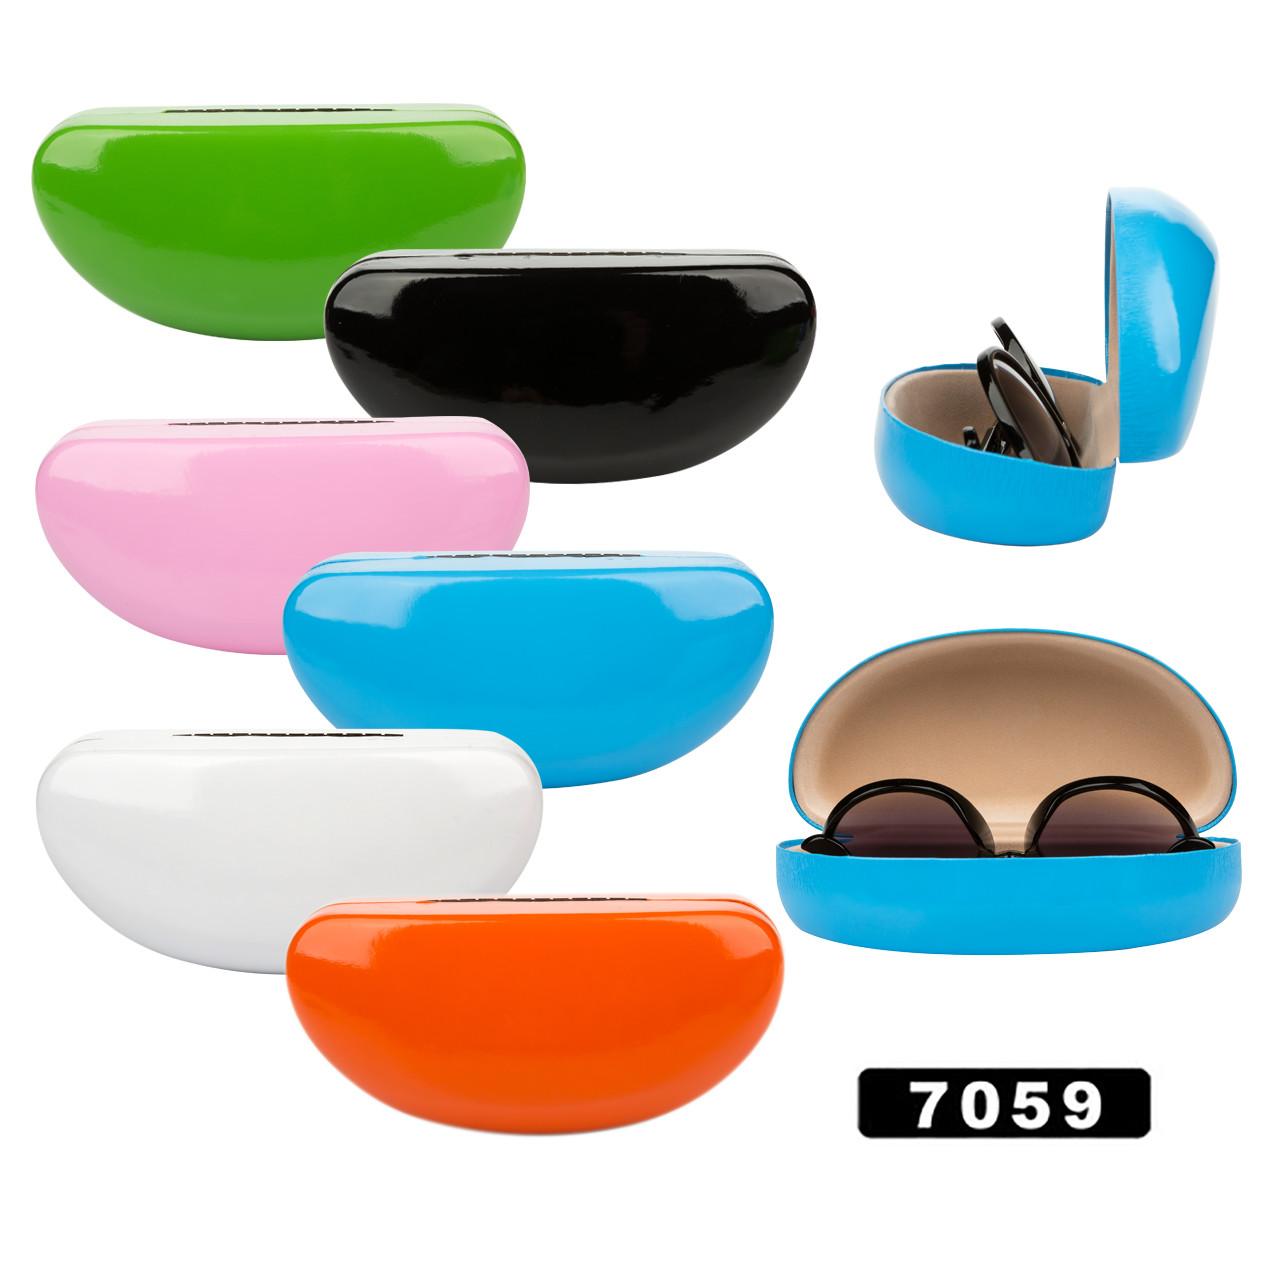 Sunglass Hard Cases ~ Assorted Colors 7059 (12 pcs.)